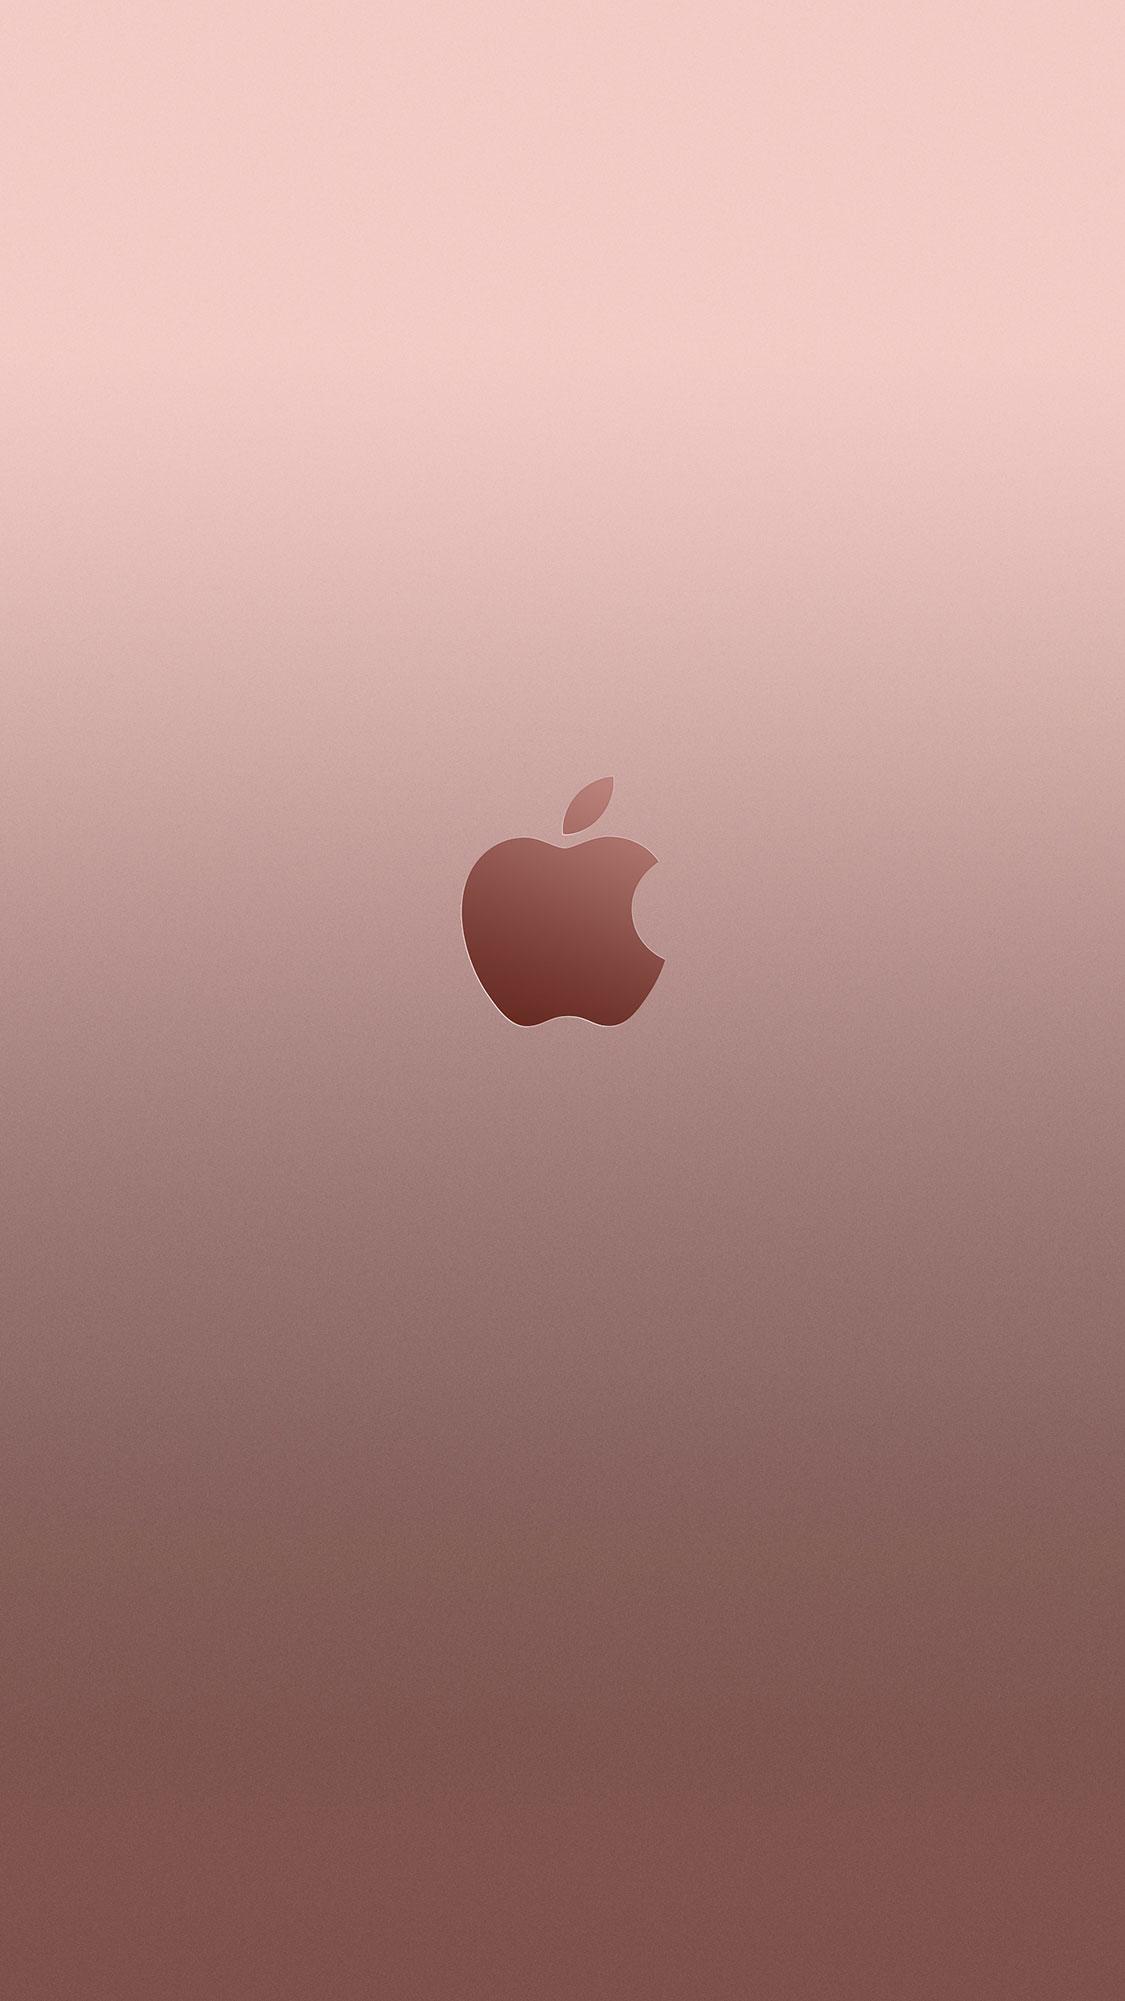 Download 900+ Wallpaper Apple Iphone 6s HD Paling Baru